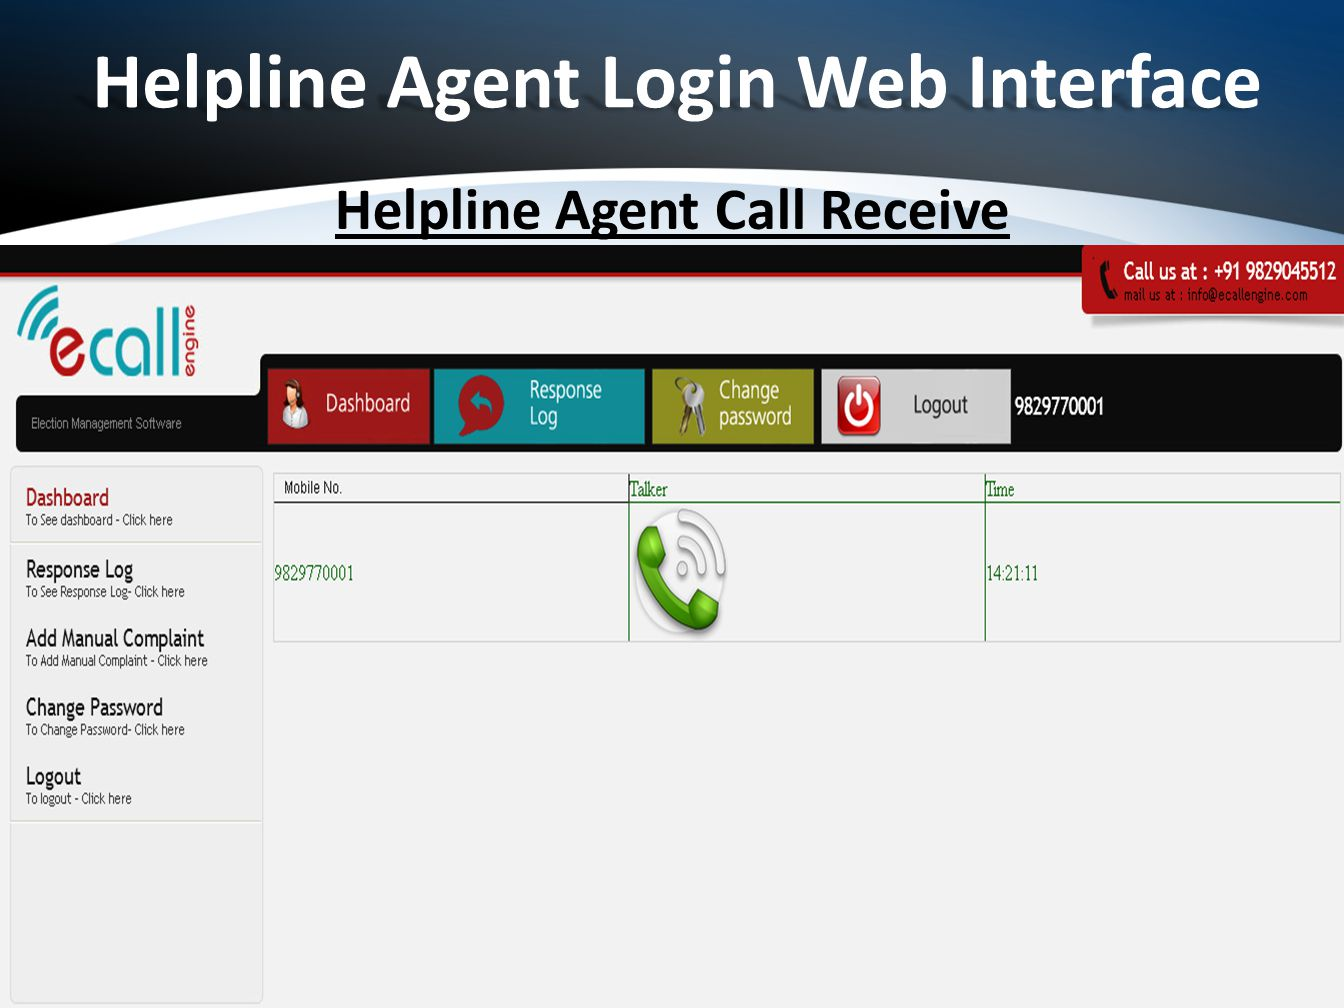 Helpline Agent Call Receive Helpline Agent Login Web Interface